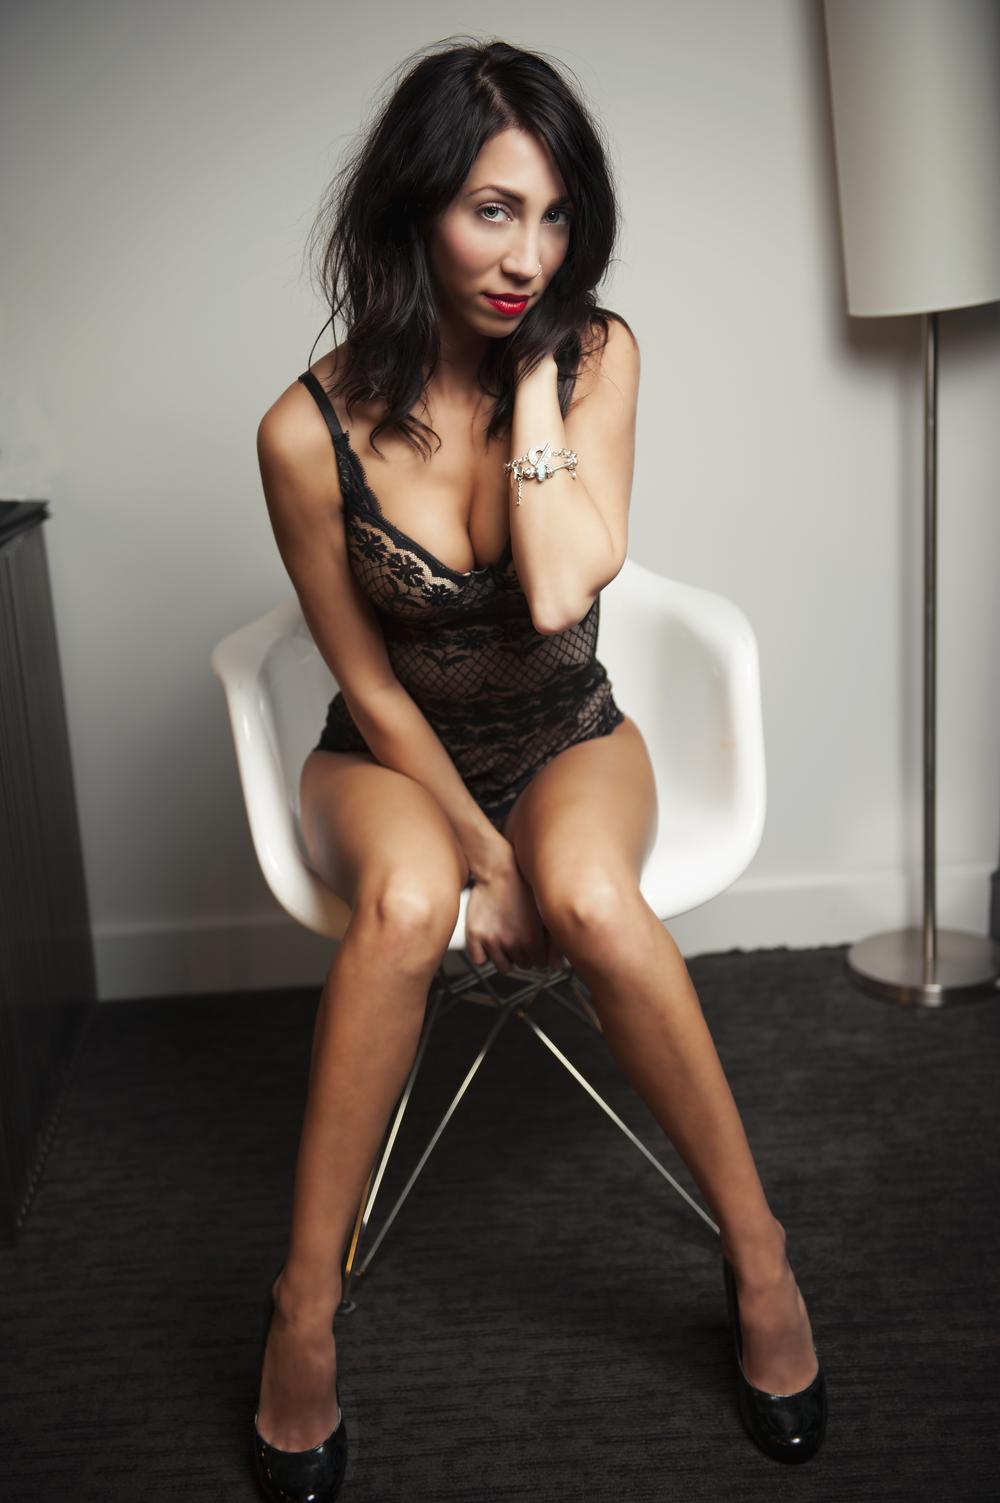 Ash sexy chair - Print.jpg